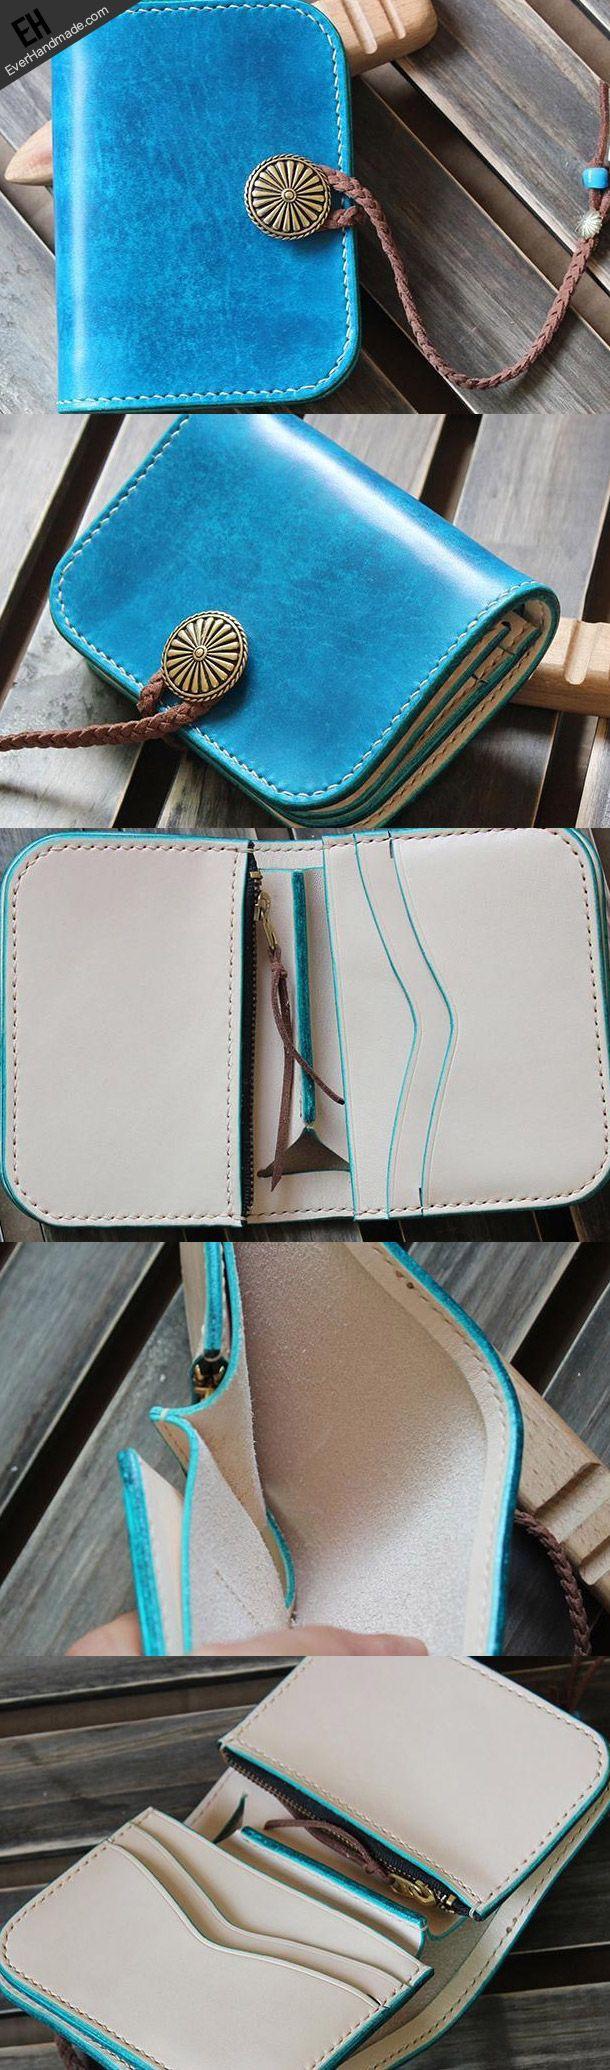 Handmade custom vintage purse leather wallet short small wallet